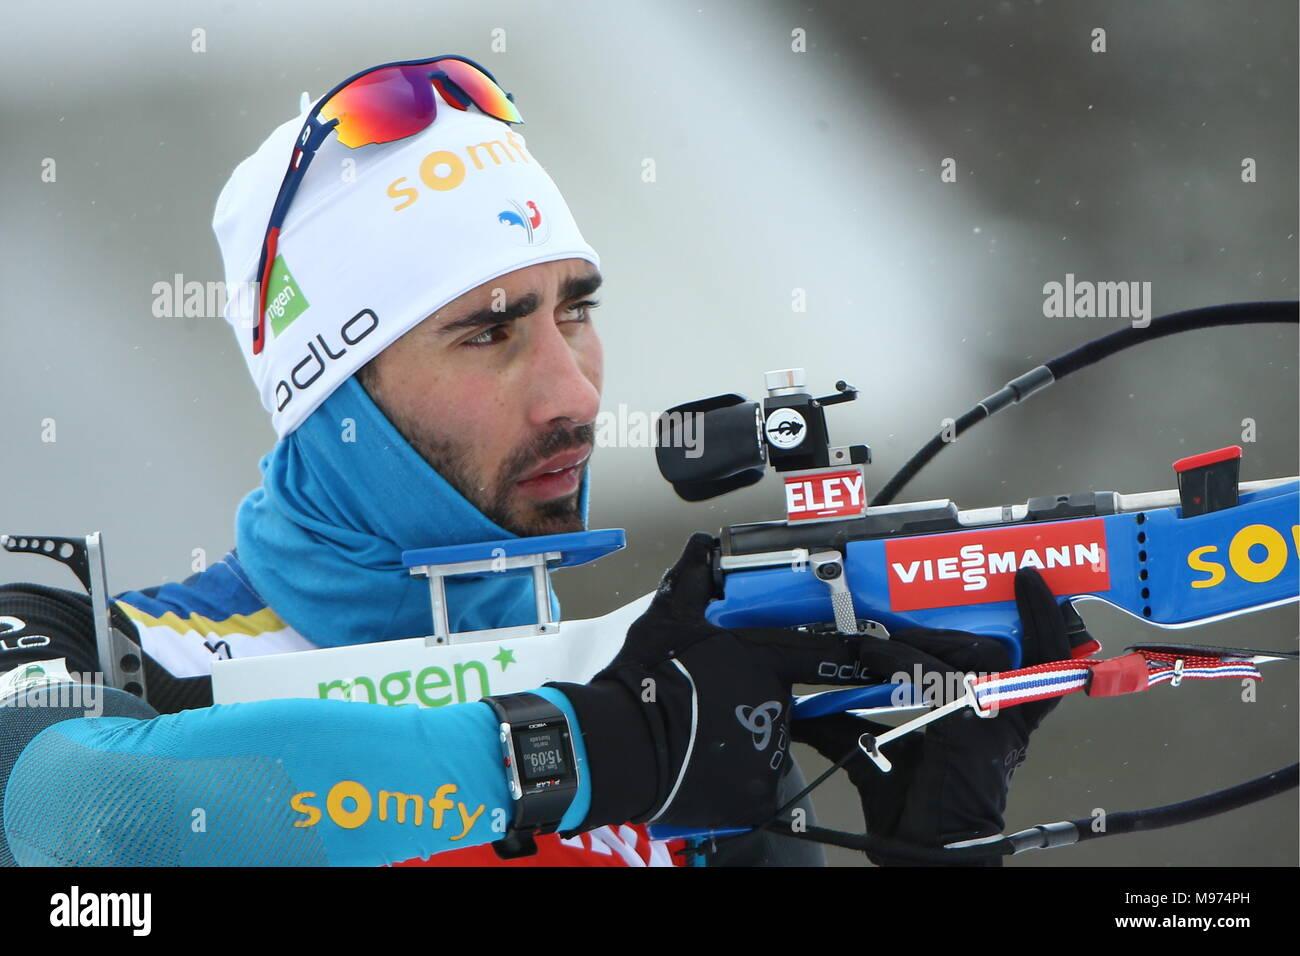 Biathlon in 2017-2018: World Cup 6